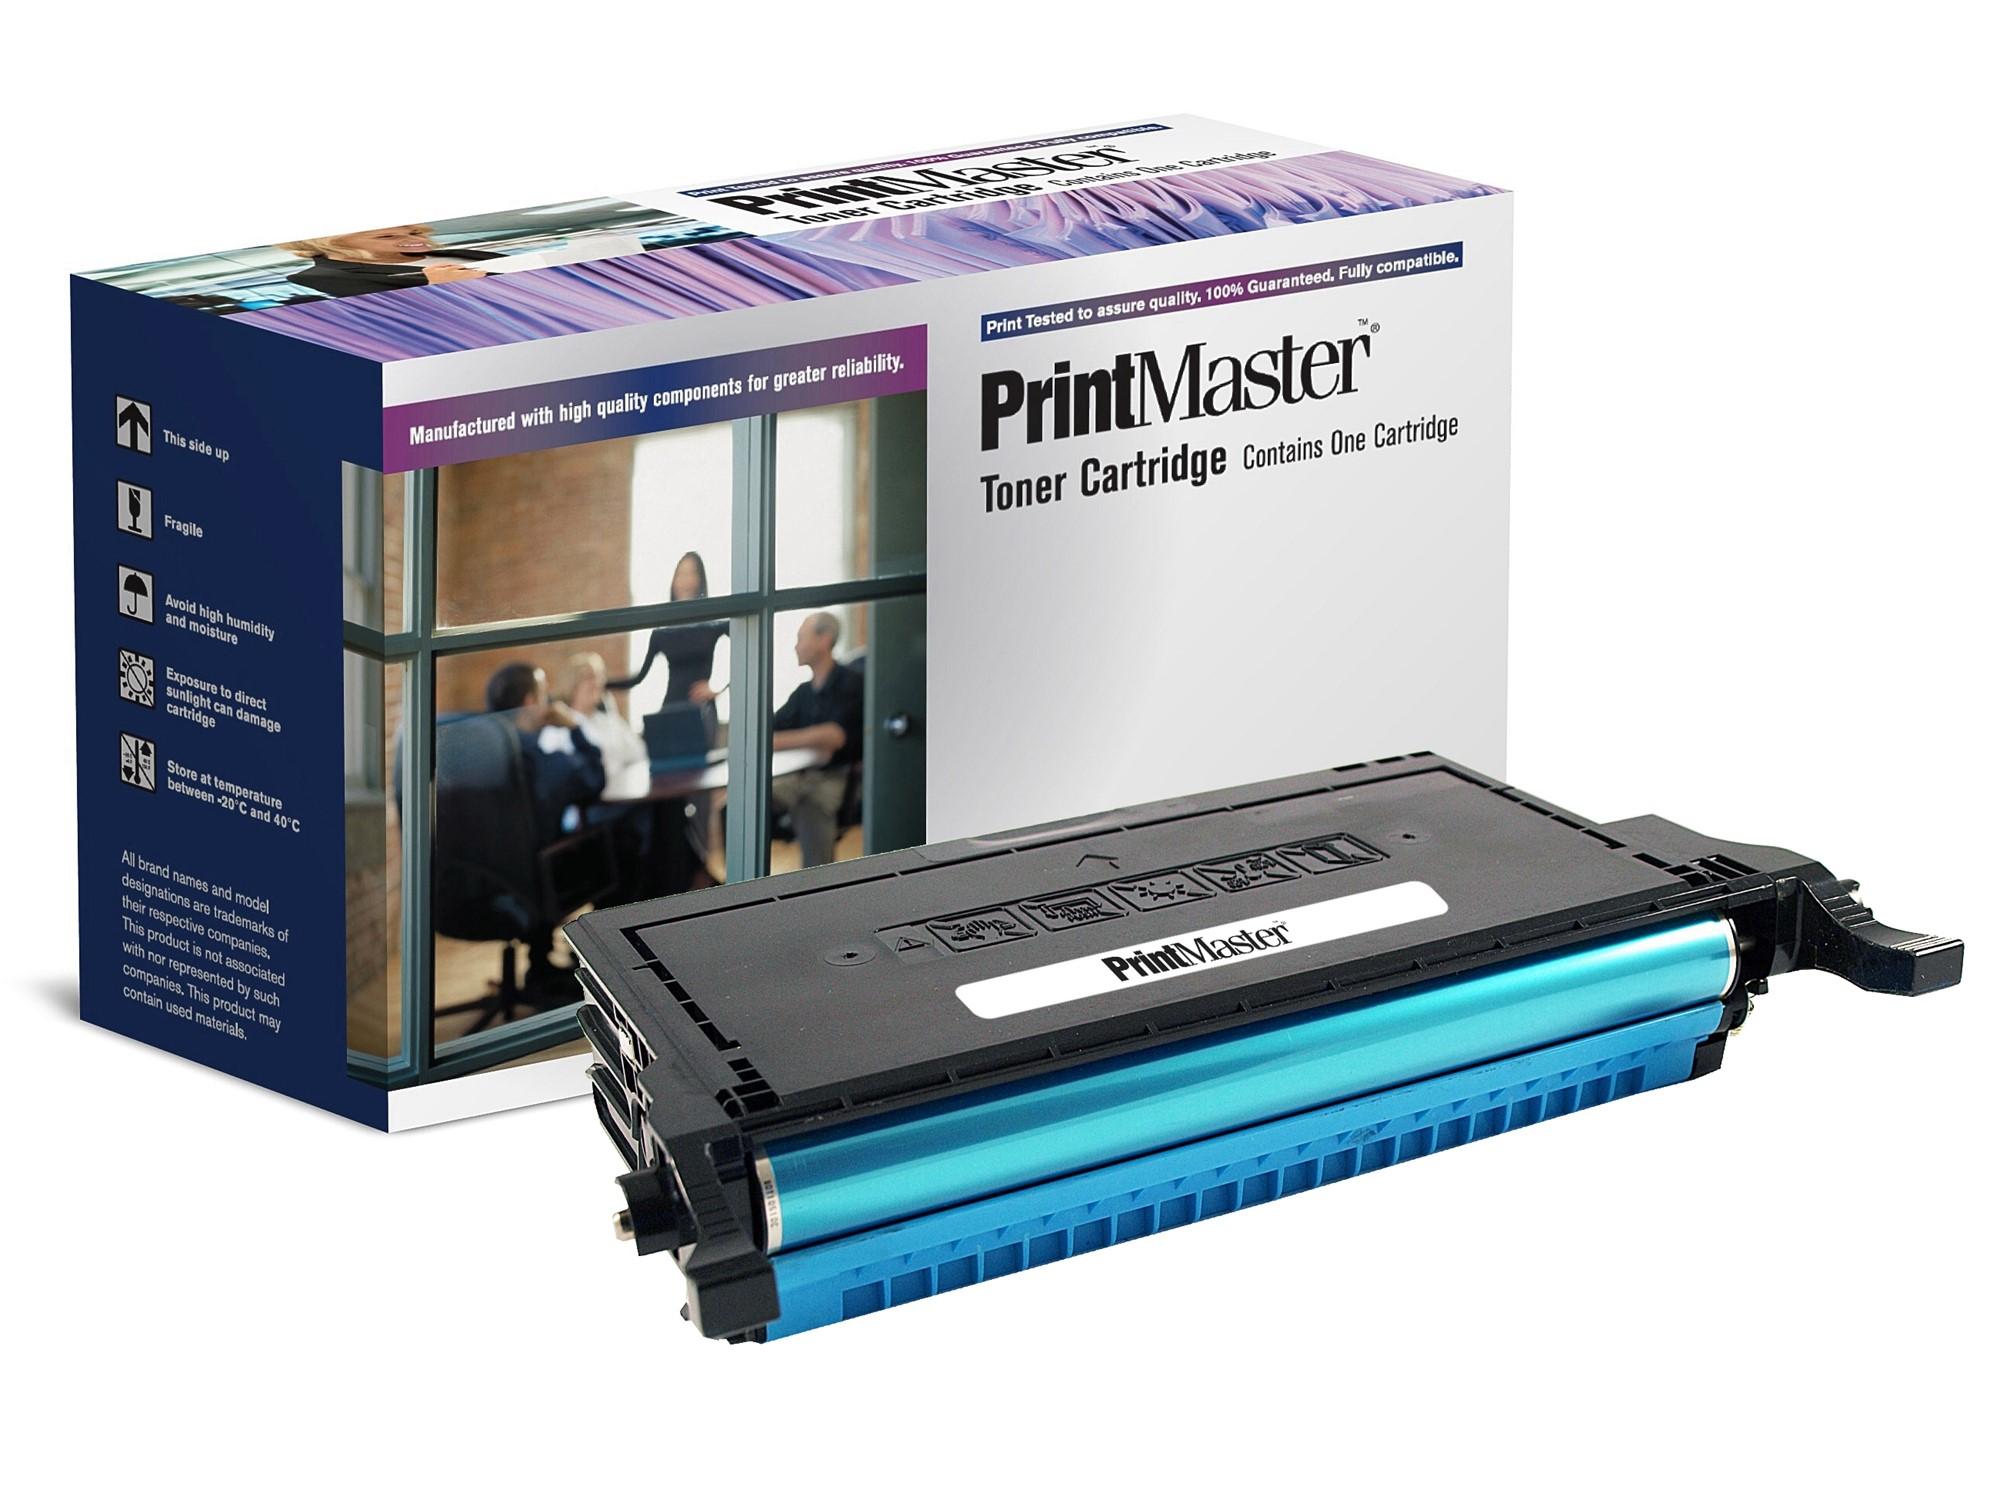 PrintMaster CLP-620/670 Magenta 4K